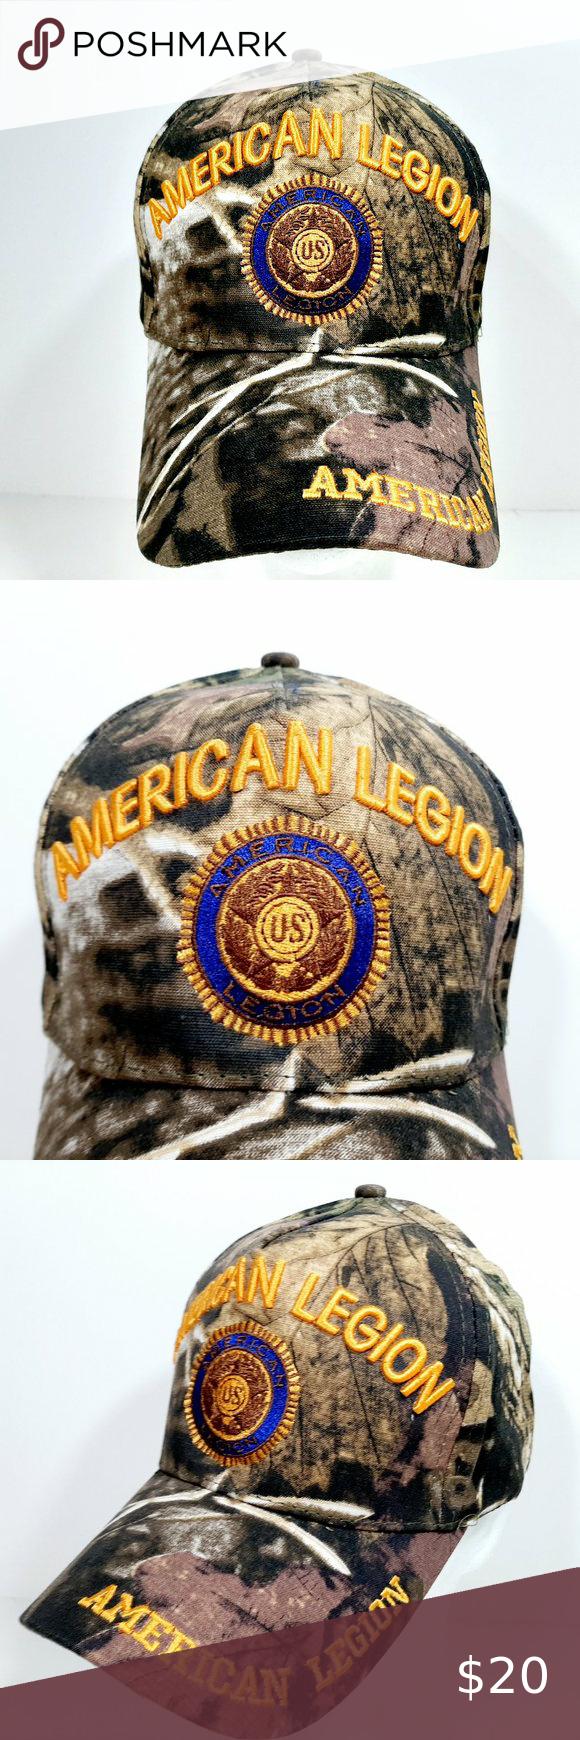 American Legion Mens Camouflage Hat Cap Embroidere Camouflage Hat Camouflage American Legions